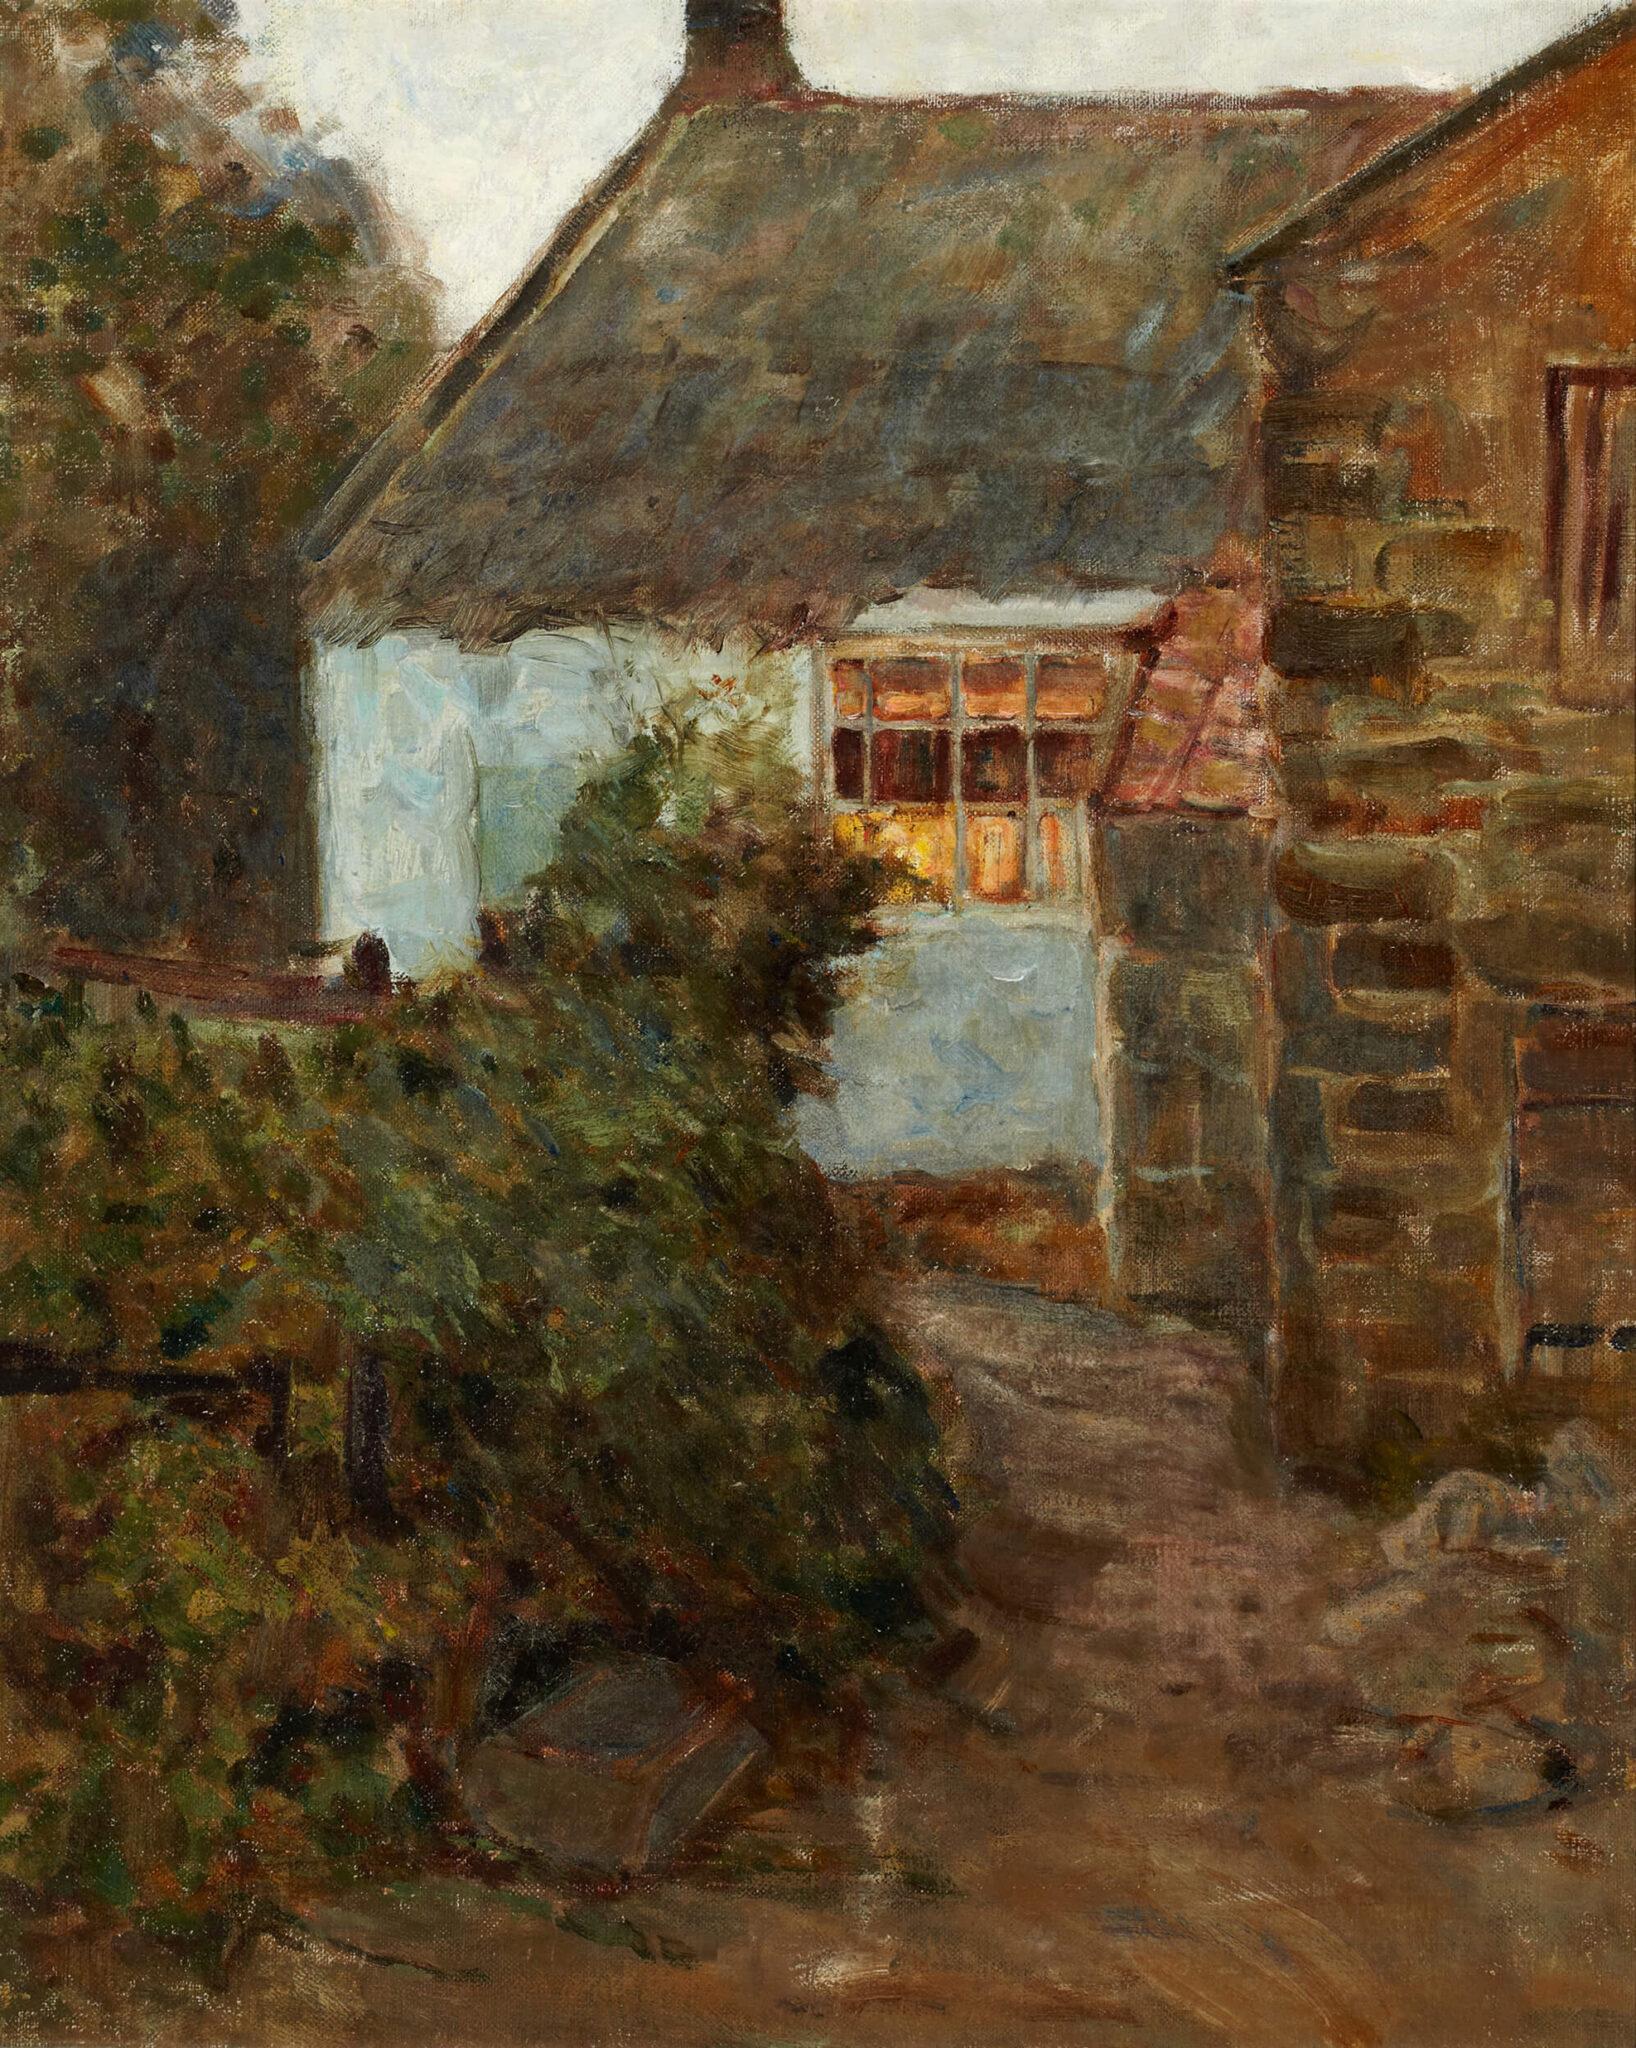 Helen McNicoll, Cottage, Evening, c.1905